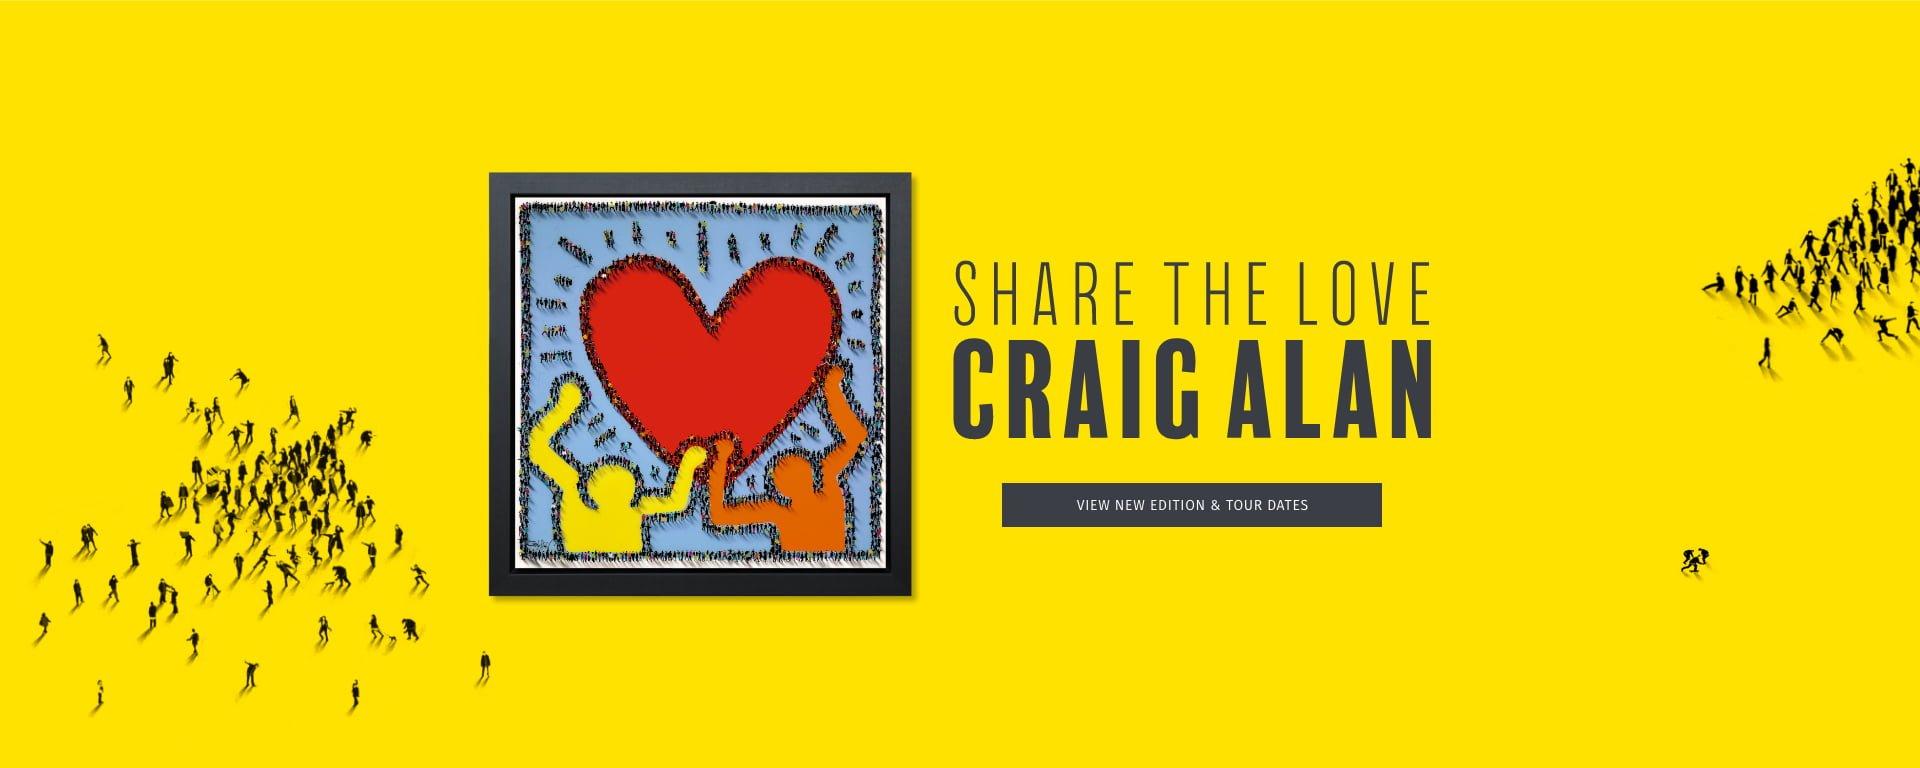 Share the love craig alan feb 2020